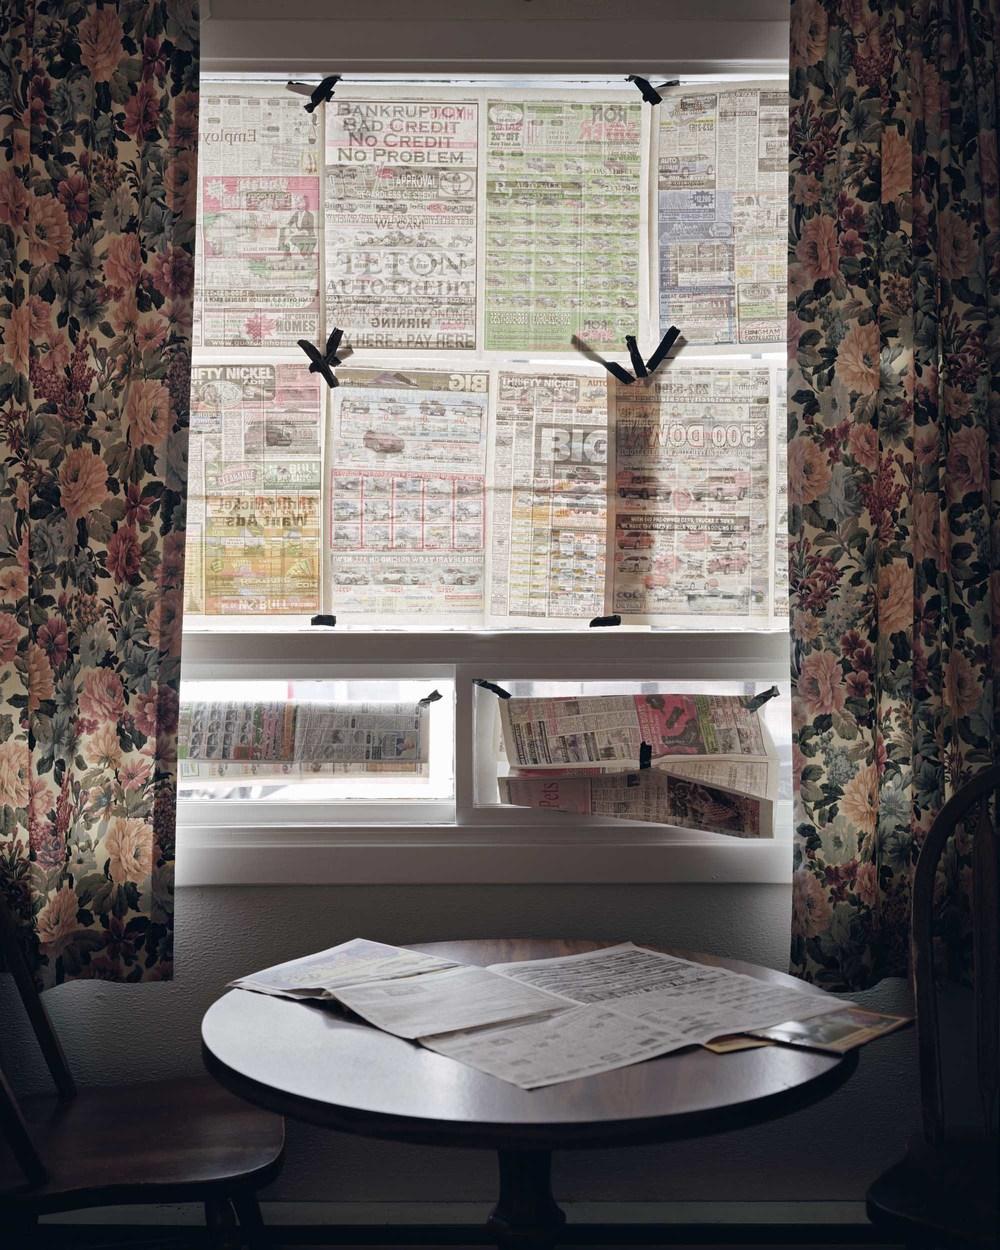 Jack Latham - Newspaper covered windows, Oregon, 2012.jpg